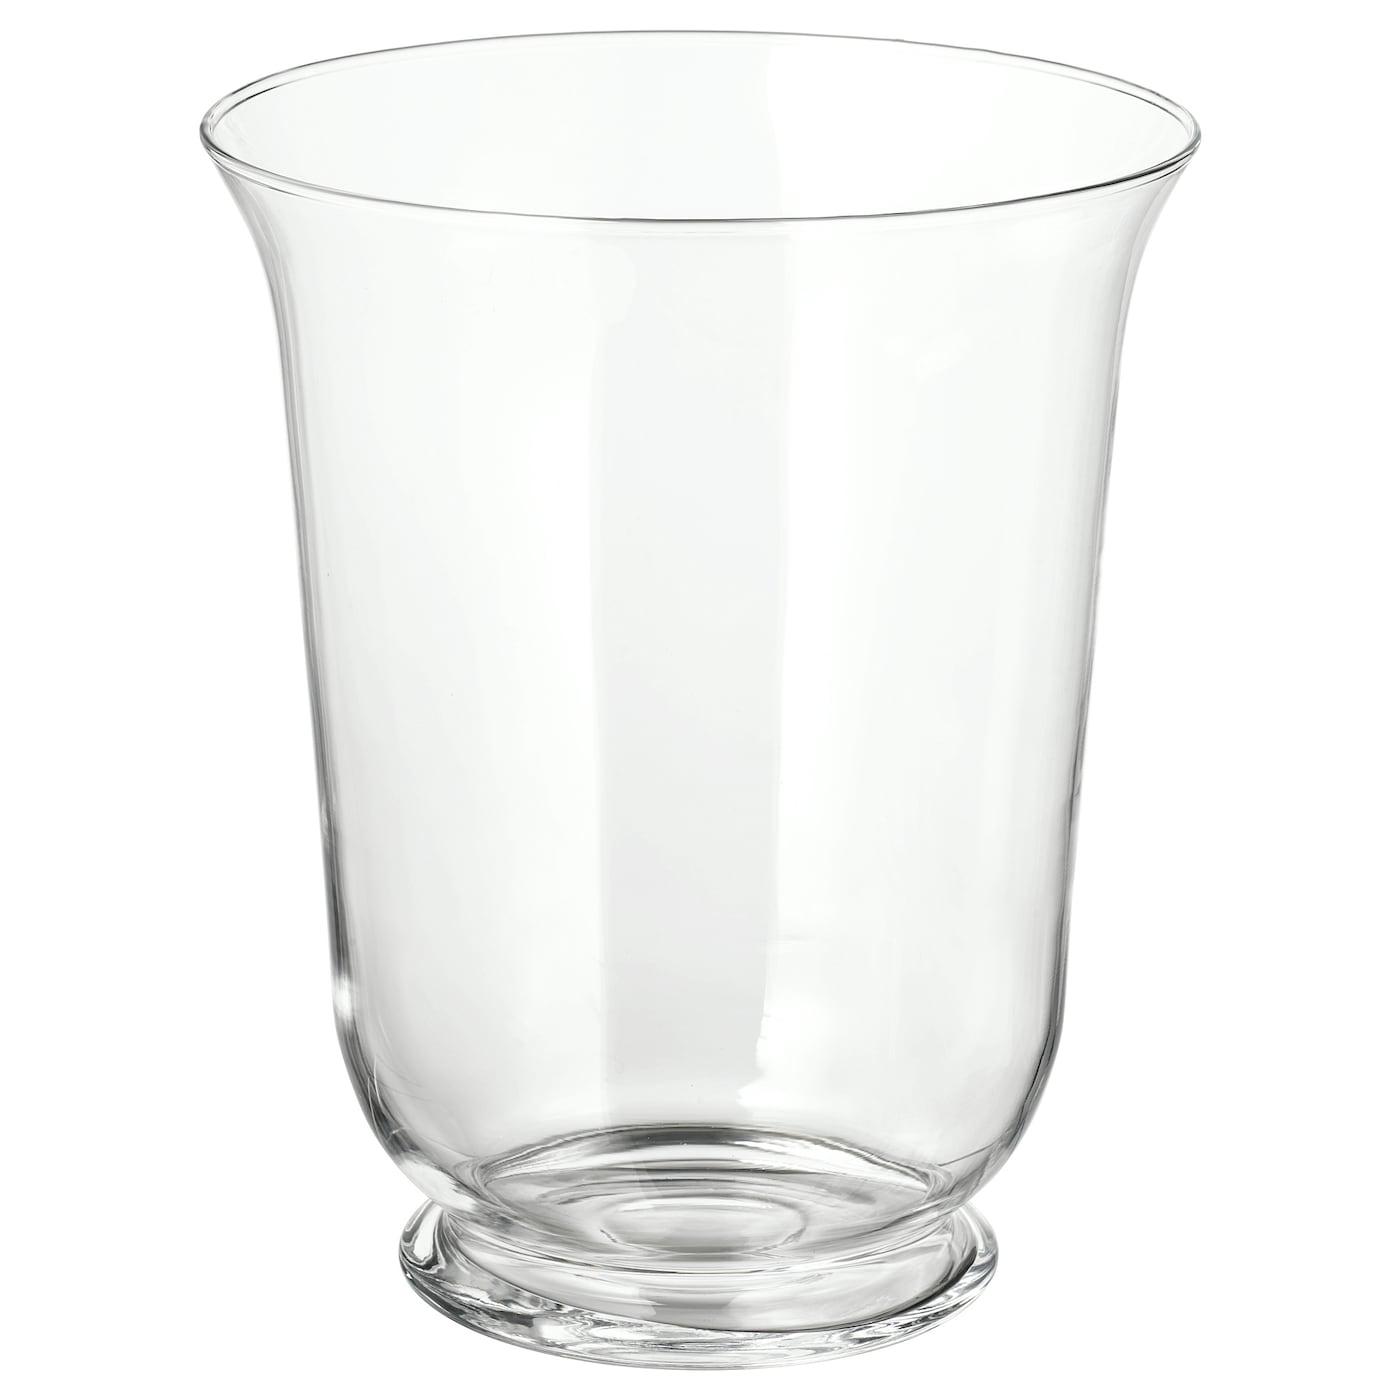 Faroles decoraci n compra online ikea for Vasi di vetro ikea